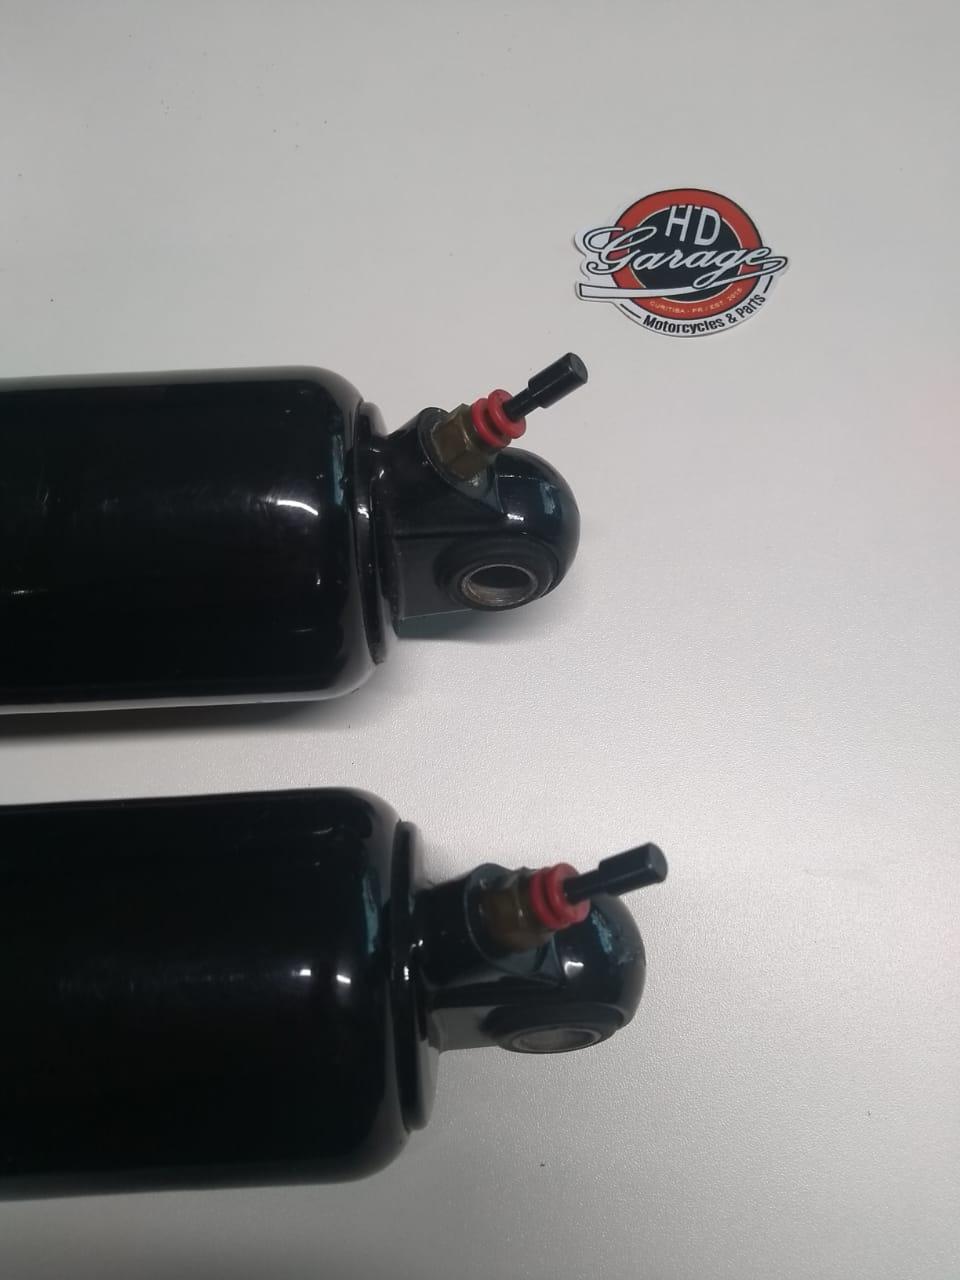 Amortecedores Genuinos Pressurizados - HD Touring - Par - 005/45809